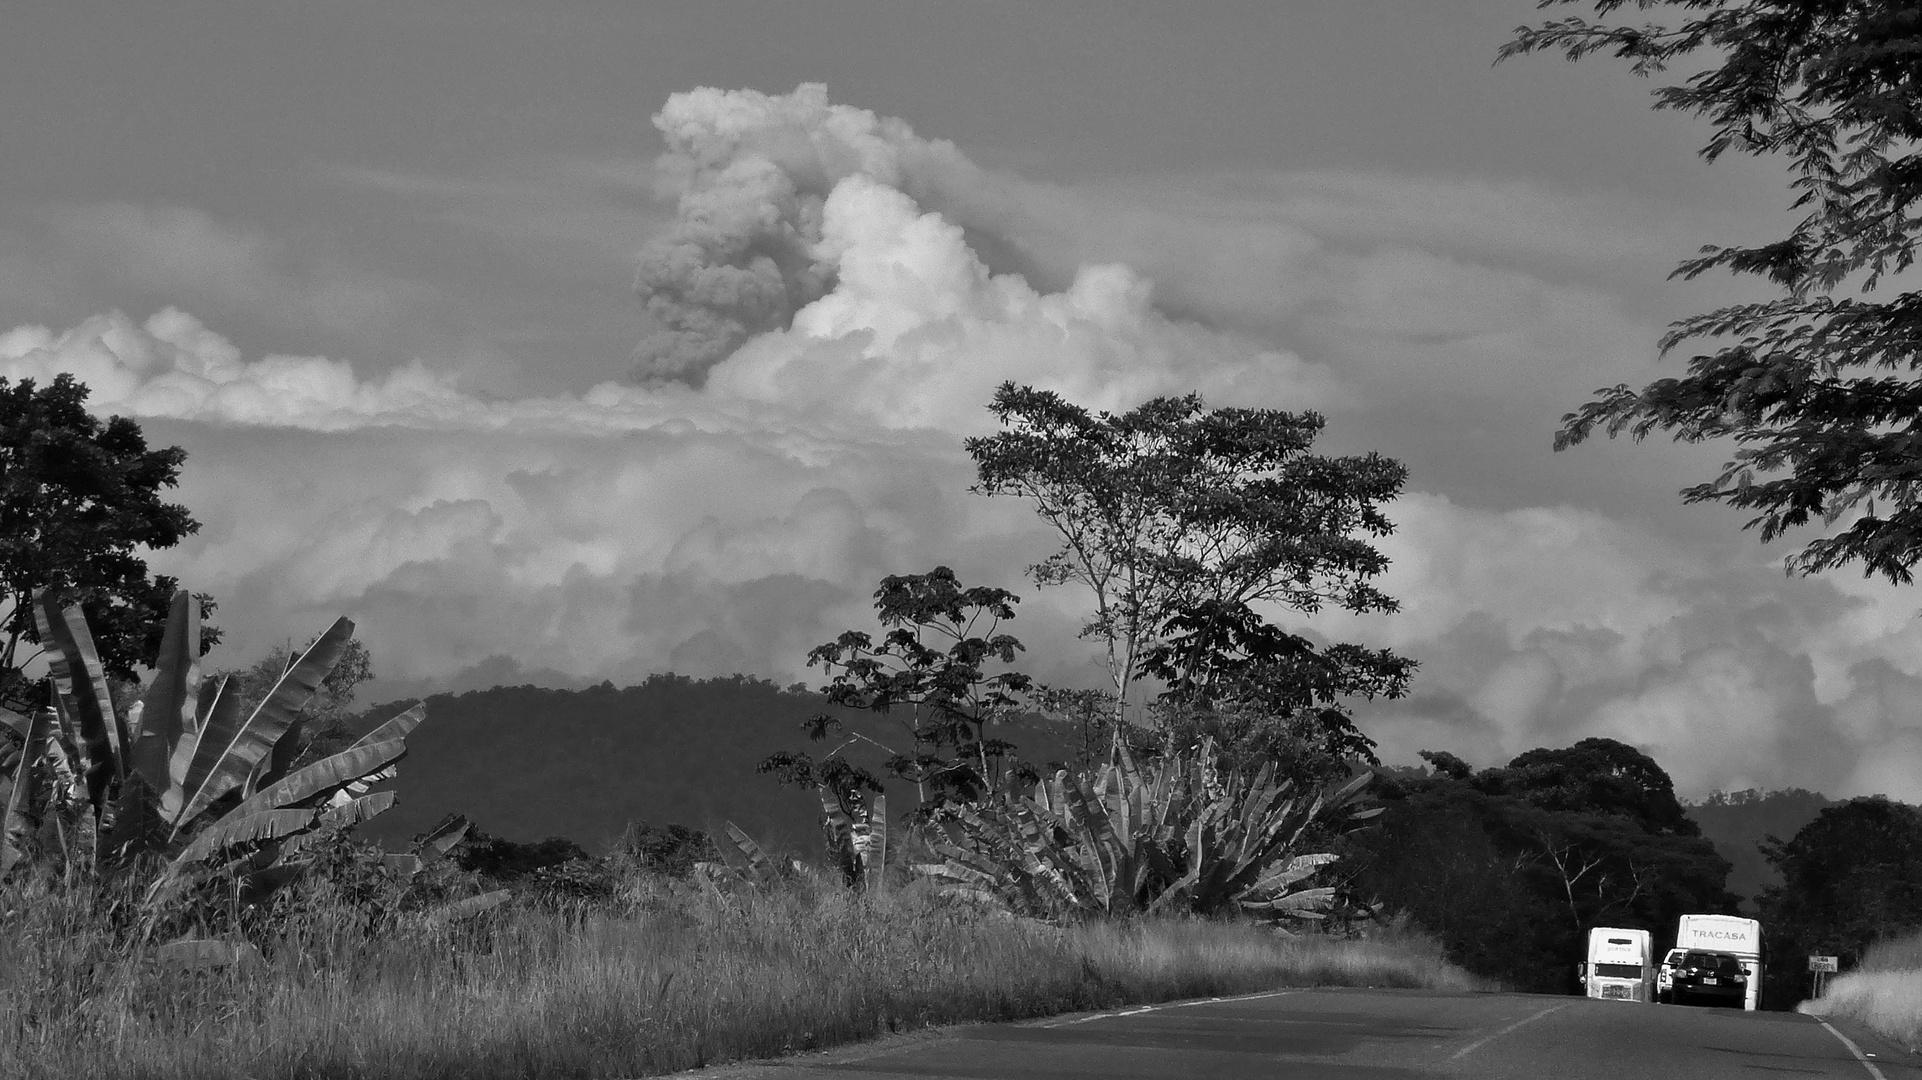 Aschewolke am 31.10.2014 über dem Vulkan Turrialba, Costa Rica